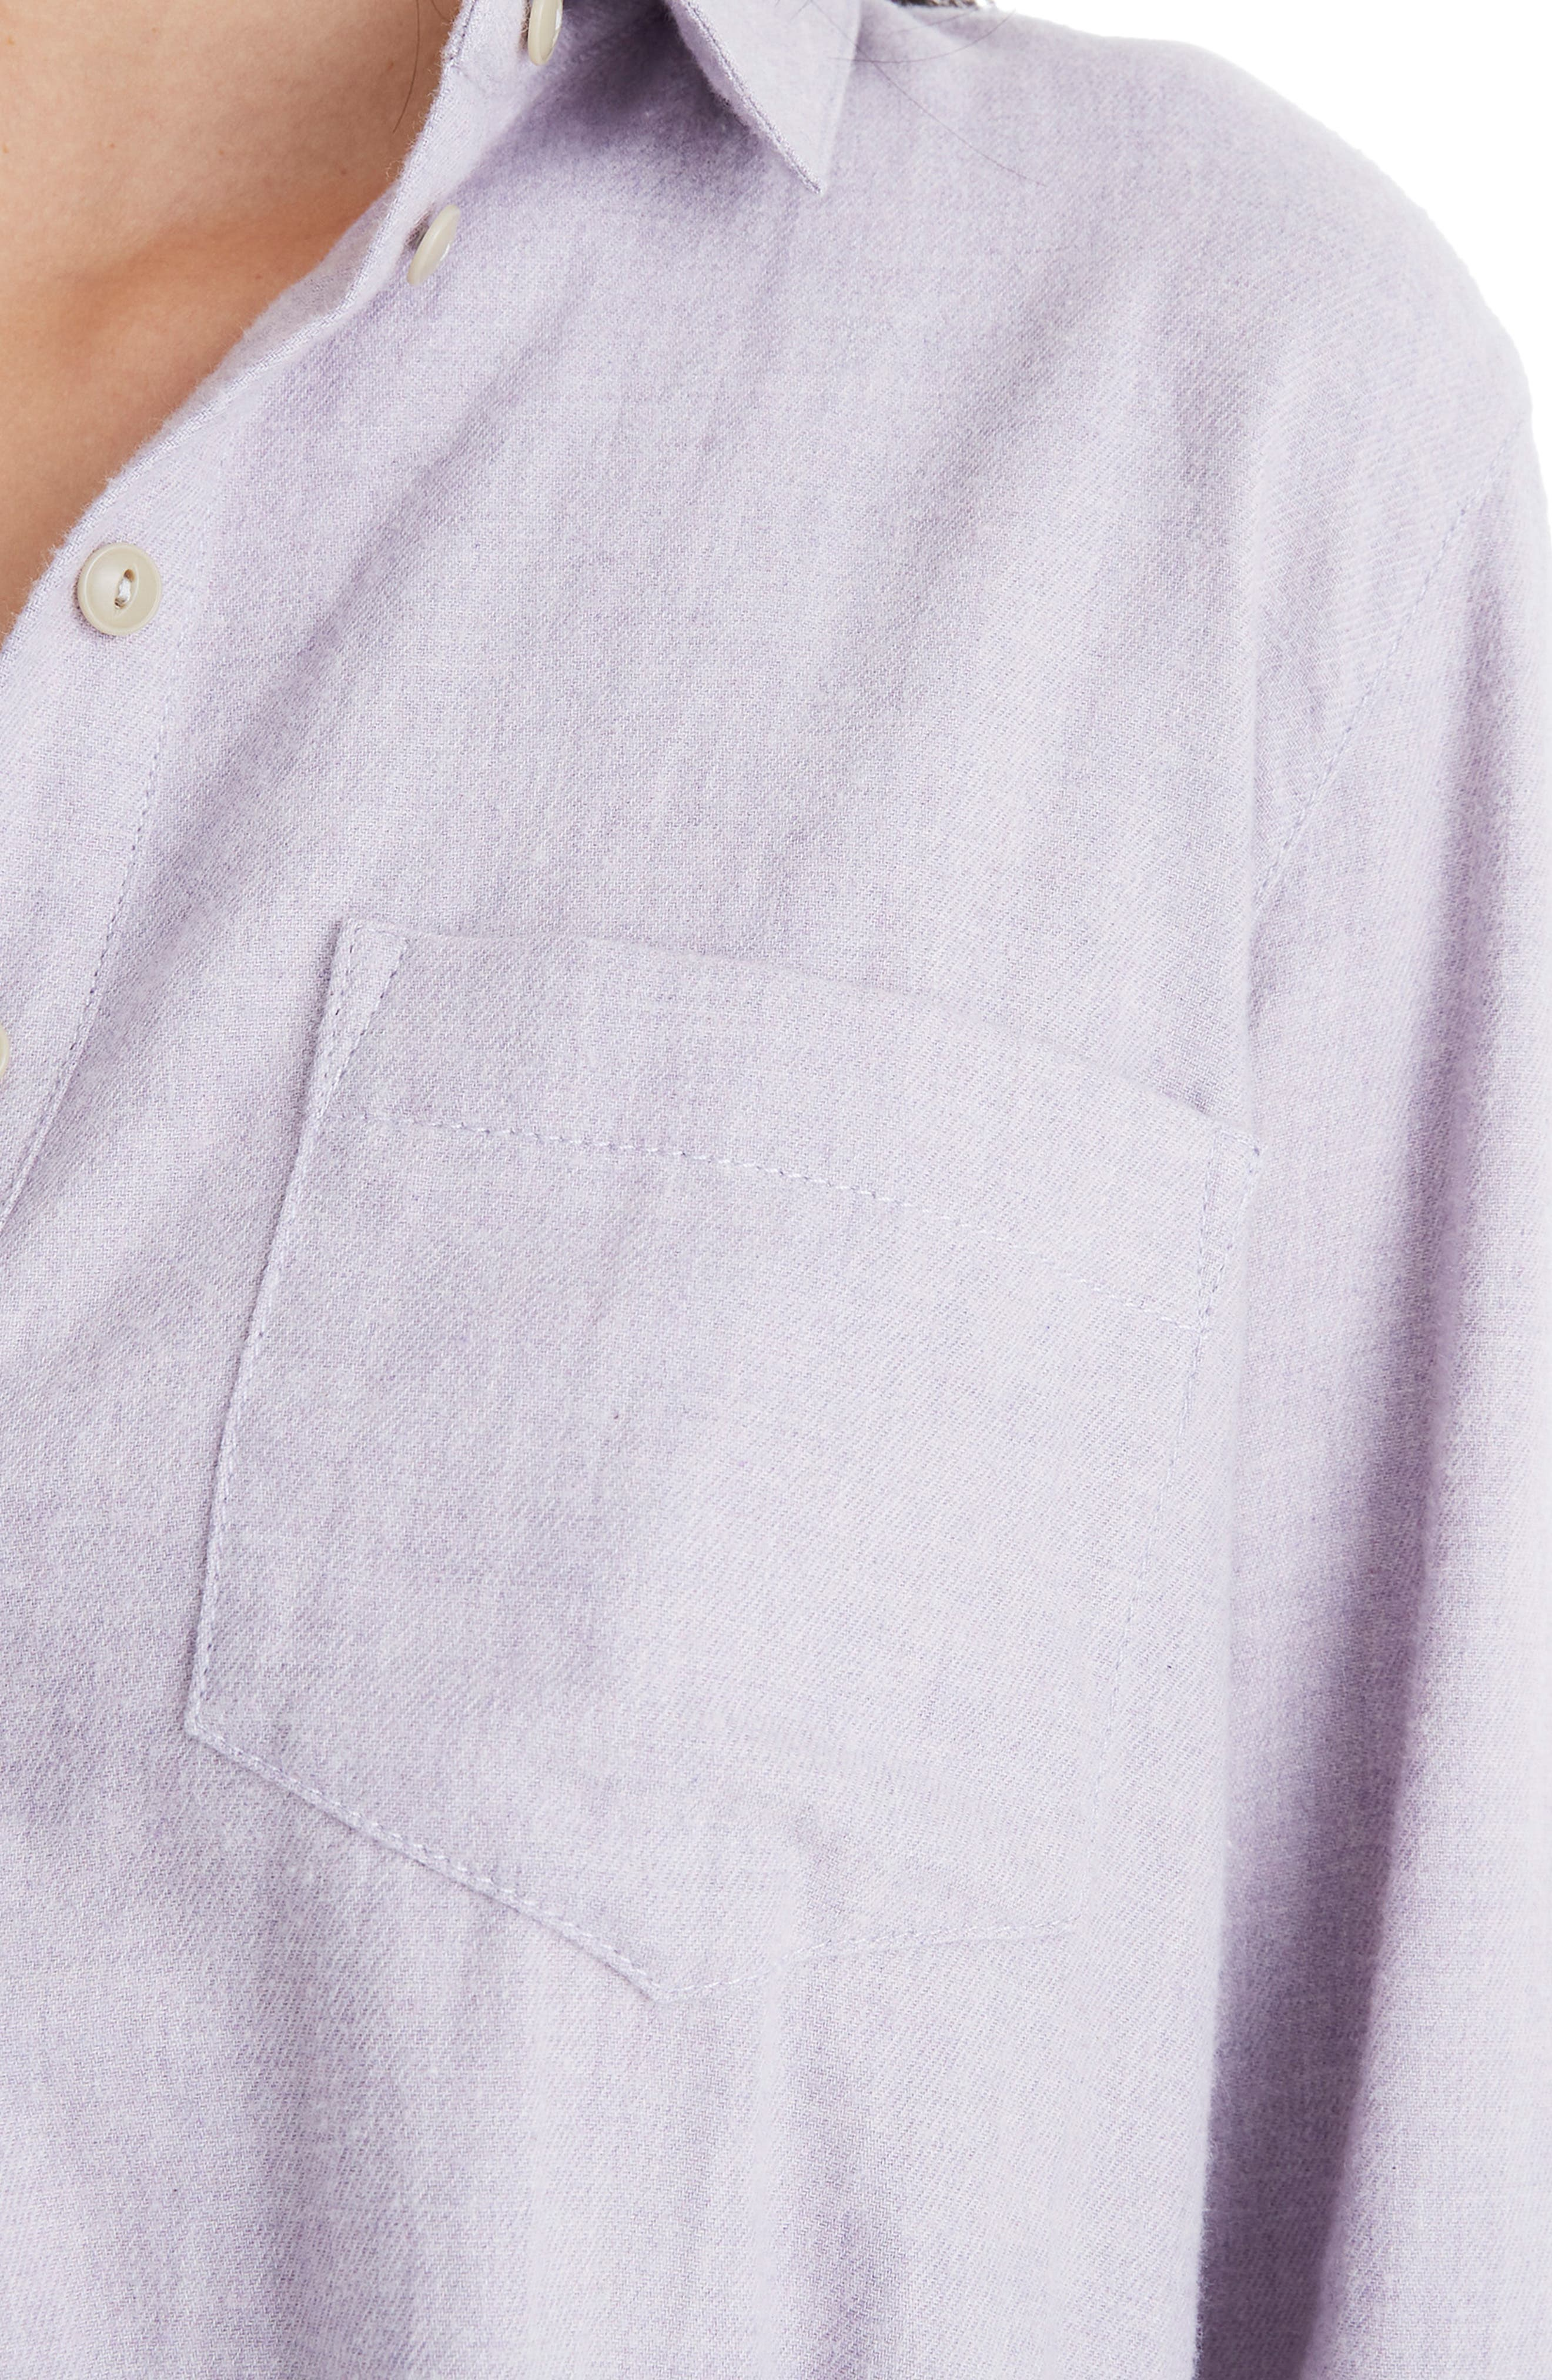 MADEWELL,                             Ex-Boyfriend Button Back Flannel Shirt,                             Alternate thumbnail 4, color,                             HEATHER THISTLE